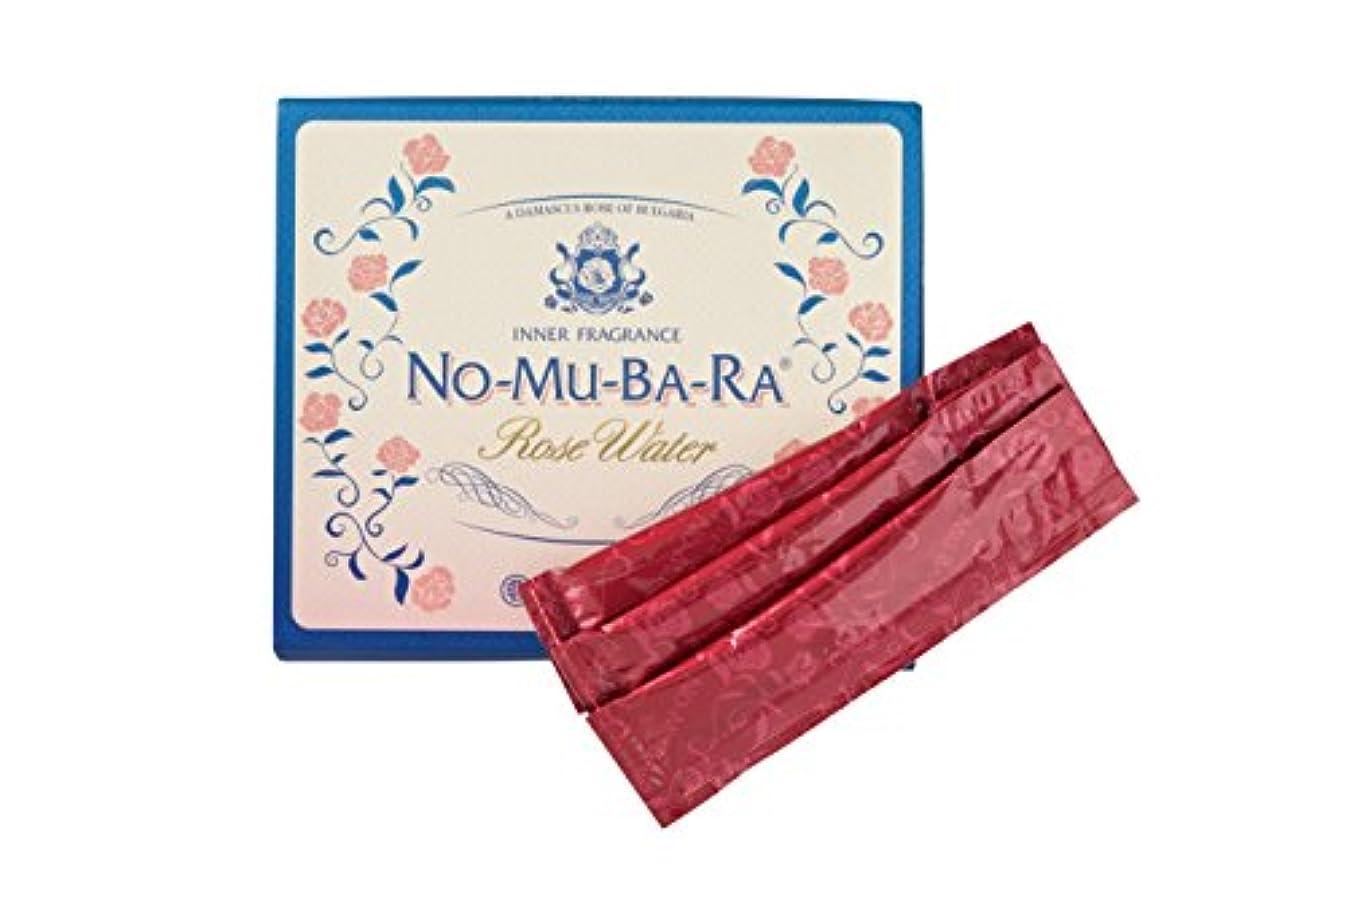 暫定の適格獲物NO-MU-BA-RA(5m l×30包入)